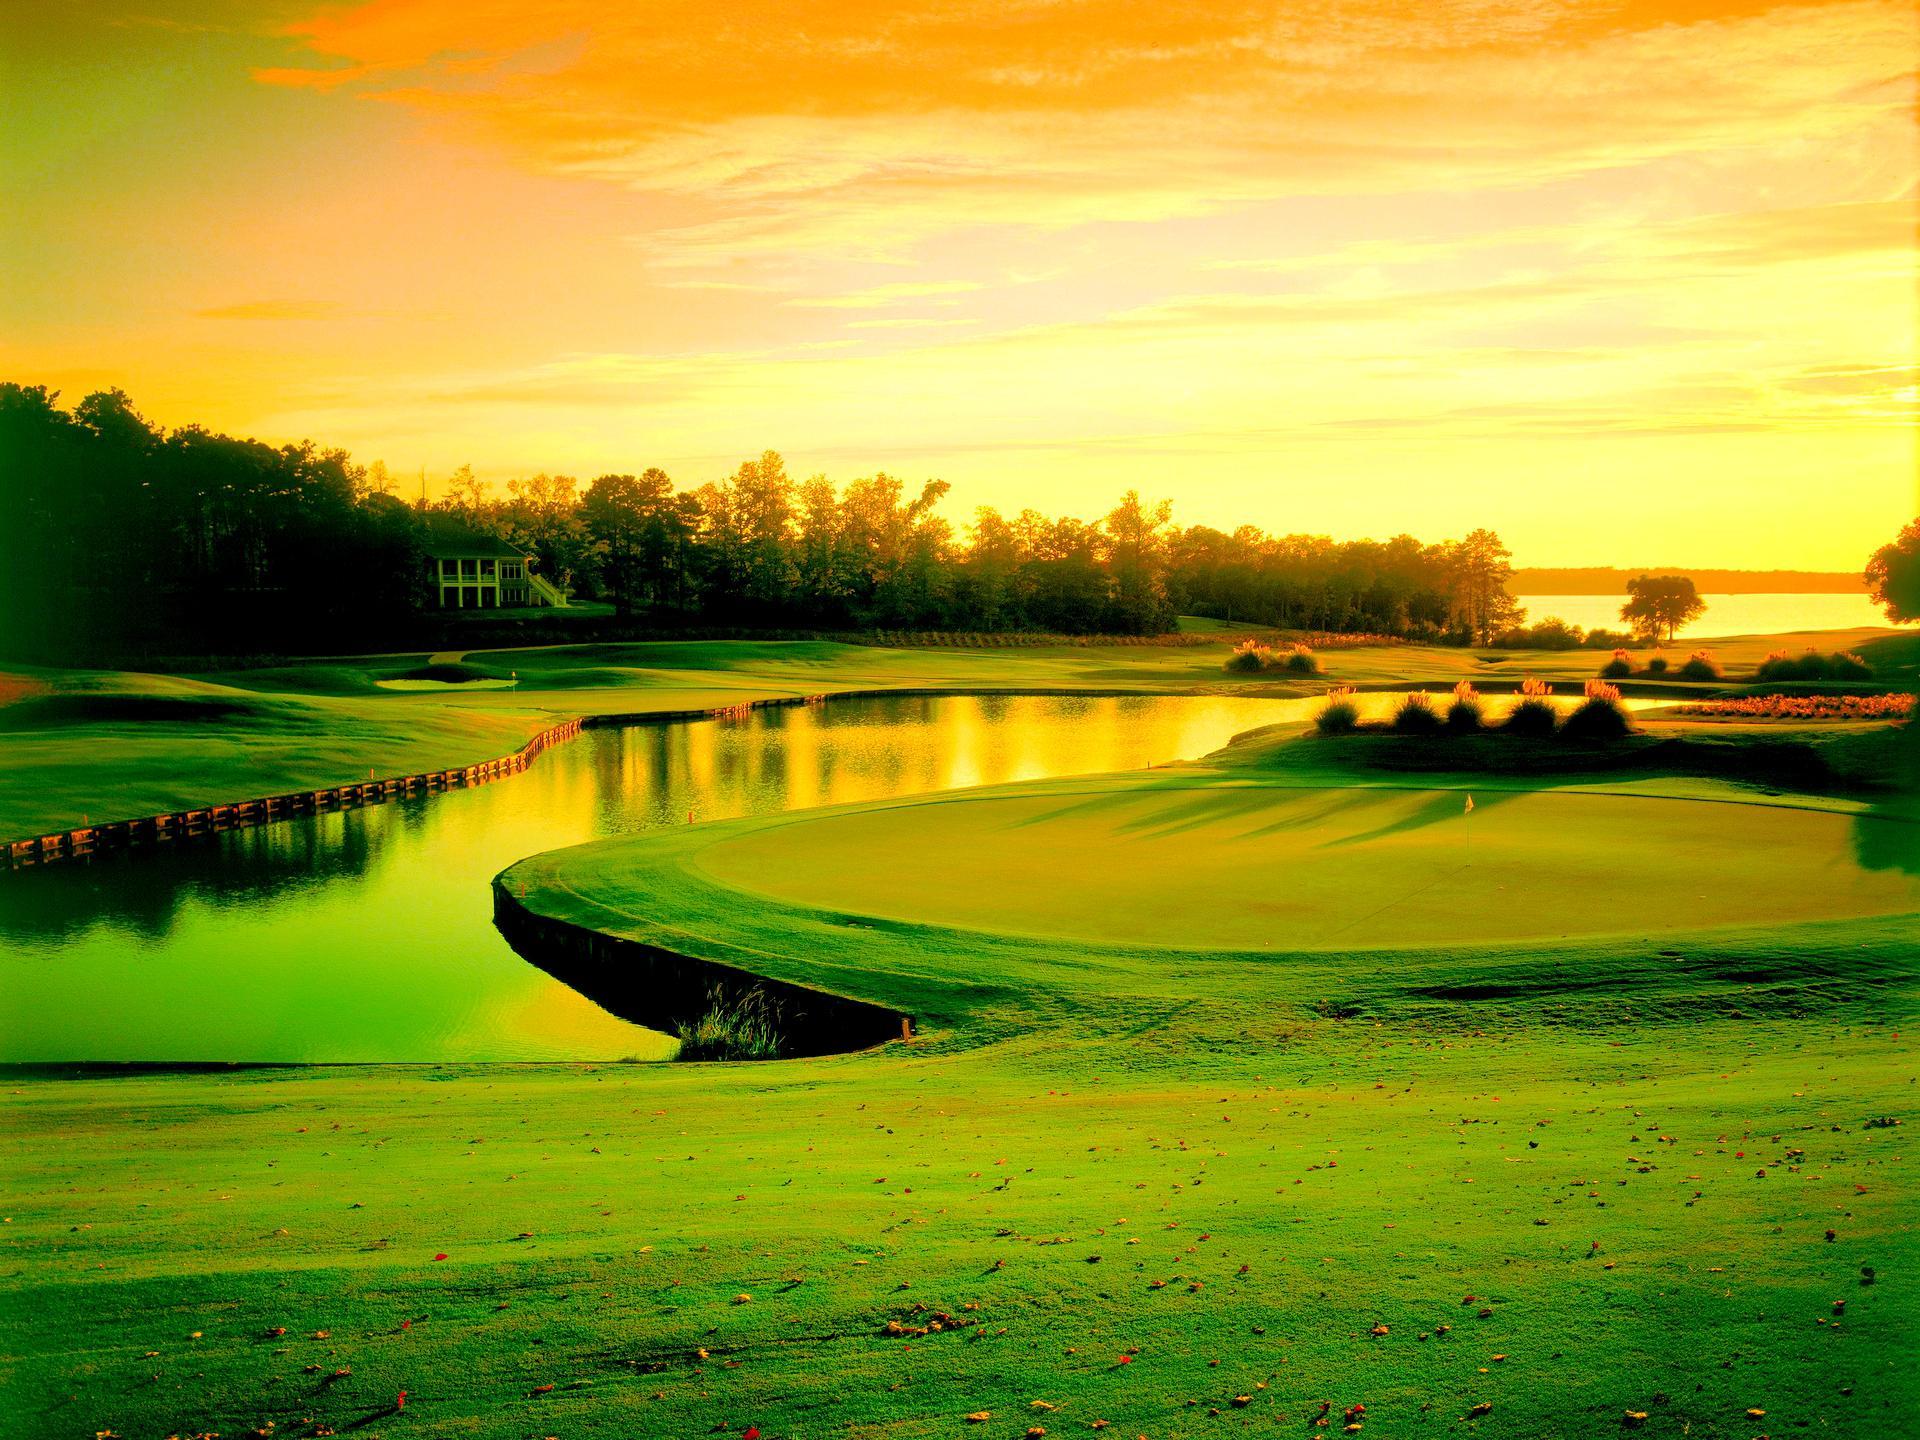 Free Golf Wallpaper And Screensavers 1920x1440